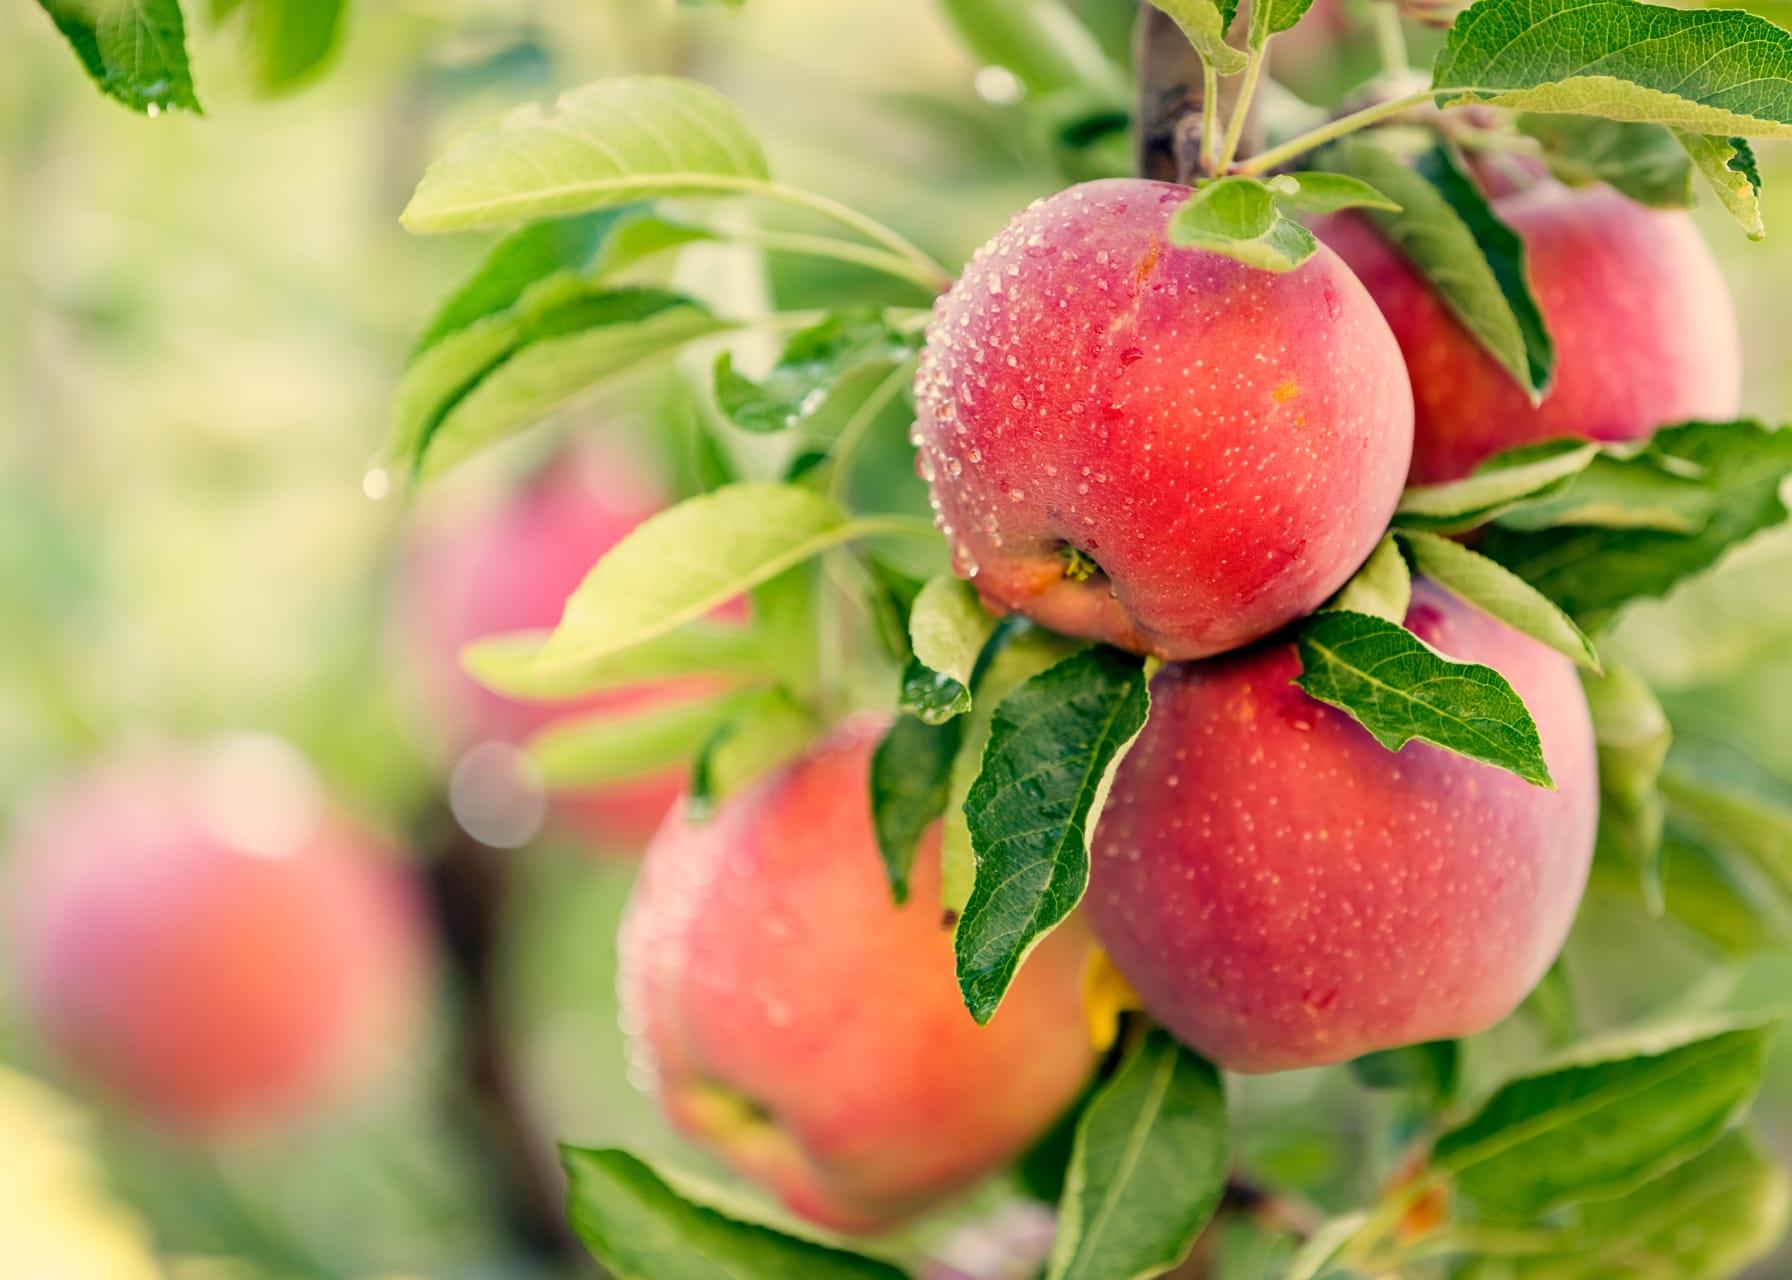 California - Apple Celebration at Gamble Garden - Fun for the Whole Family